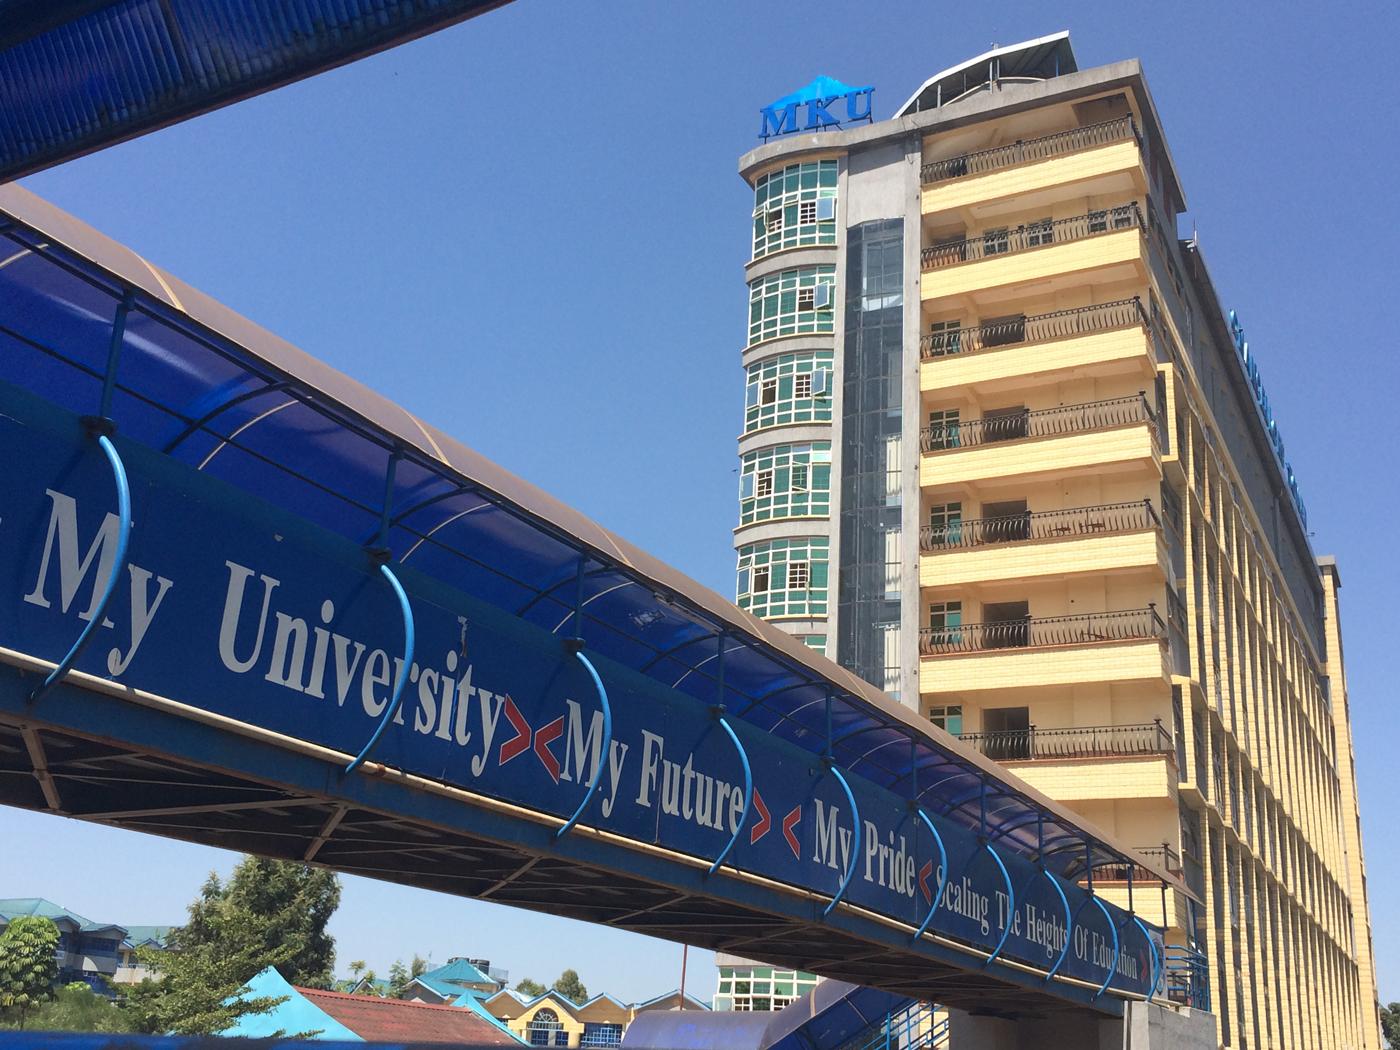 Campus dating sites i kenya